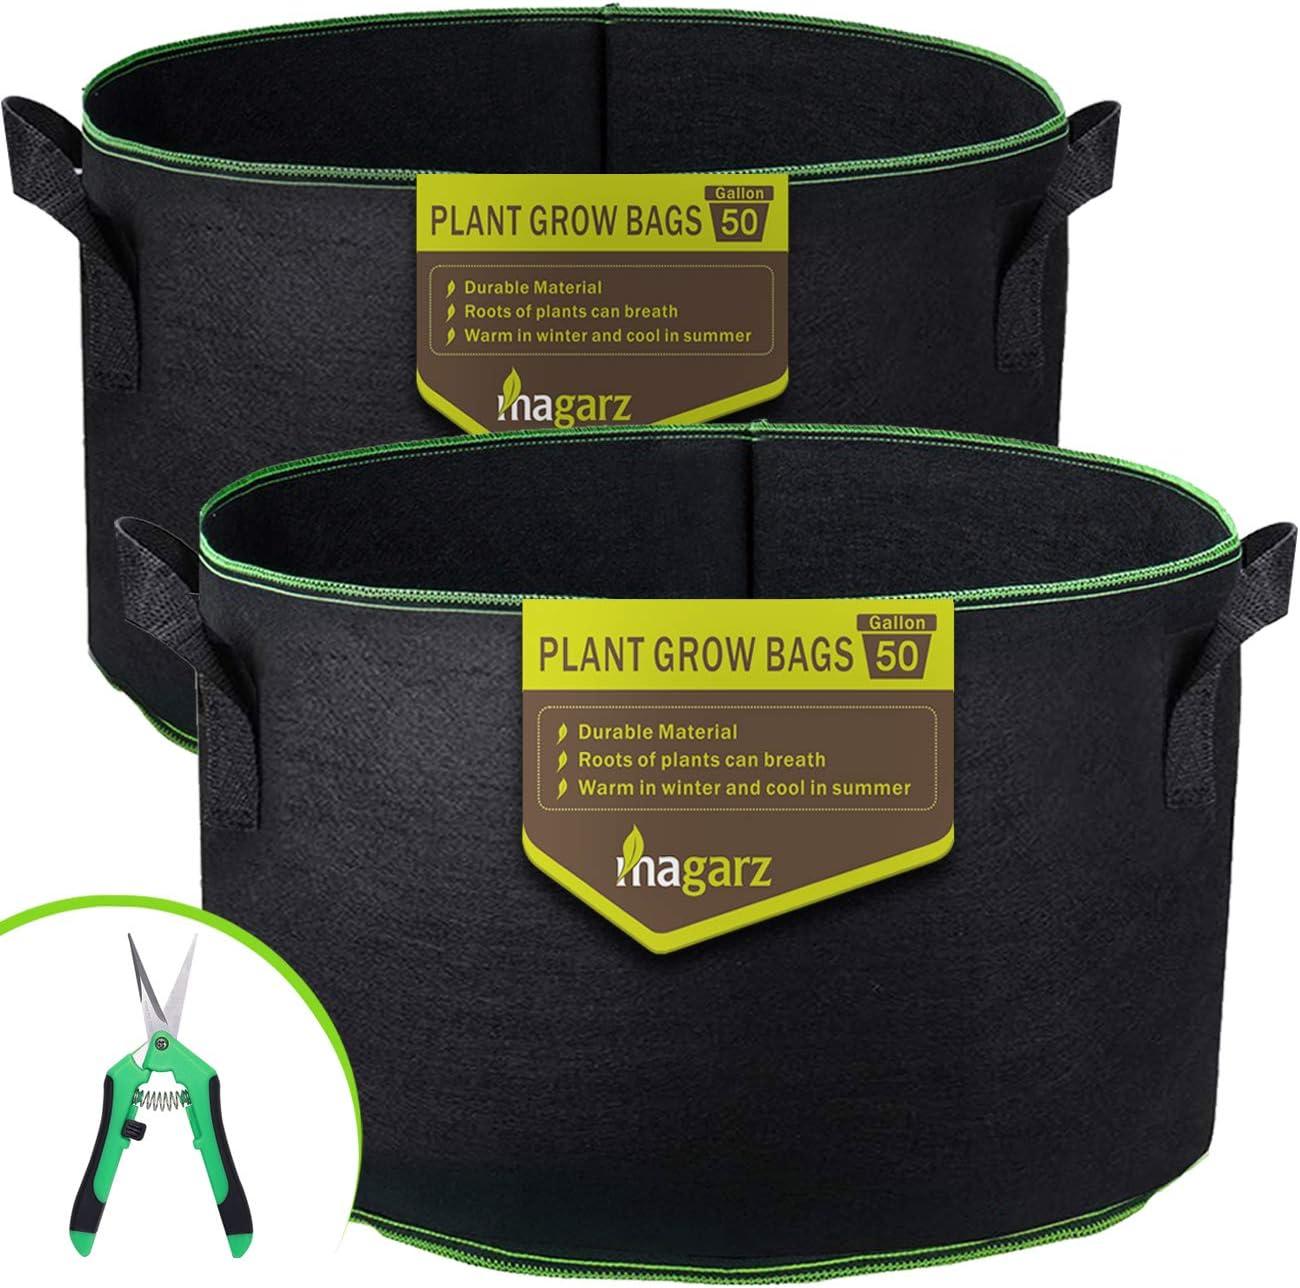 Magarz 2-Pack 50 Gallon Fabric Flower Pots Garden Felt Grow Bags with Handle (Black)